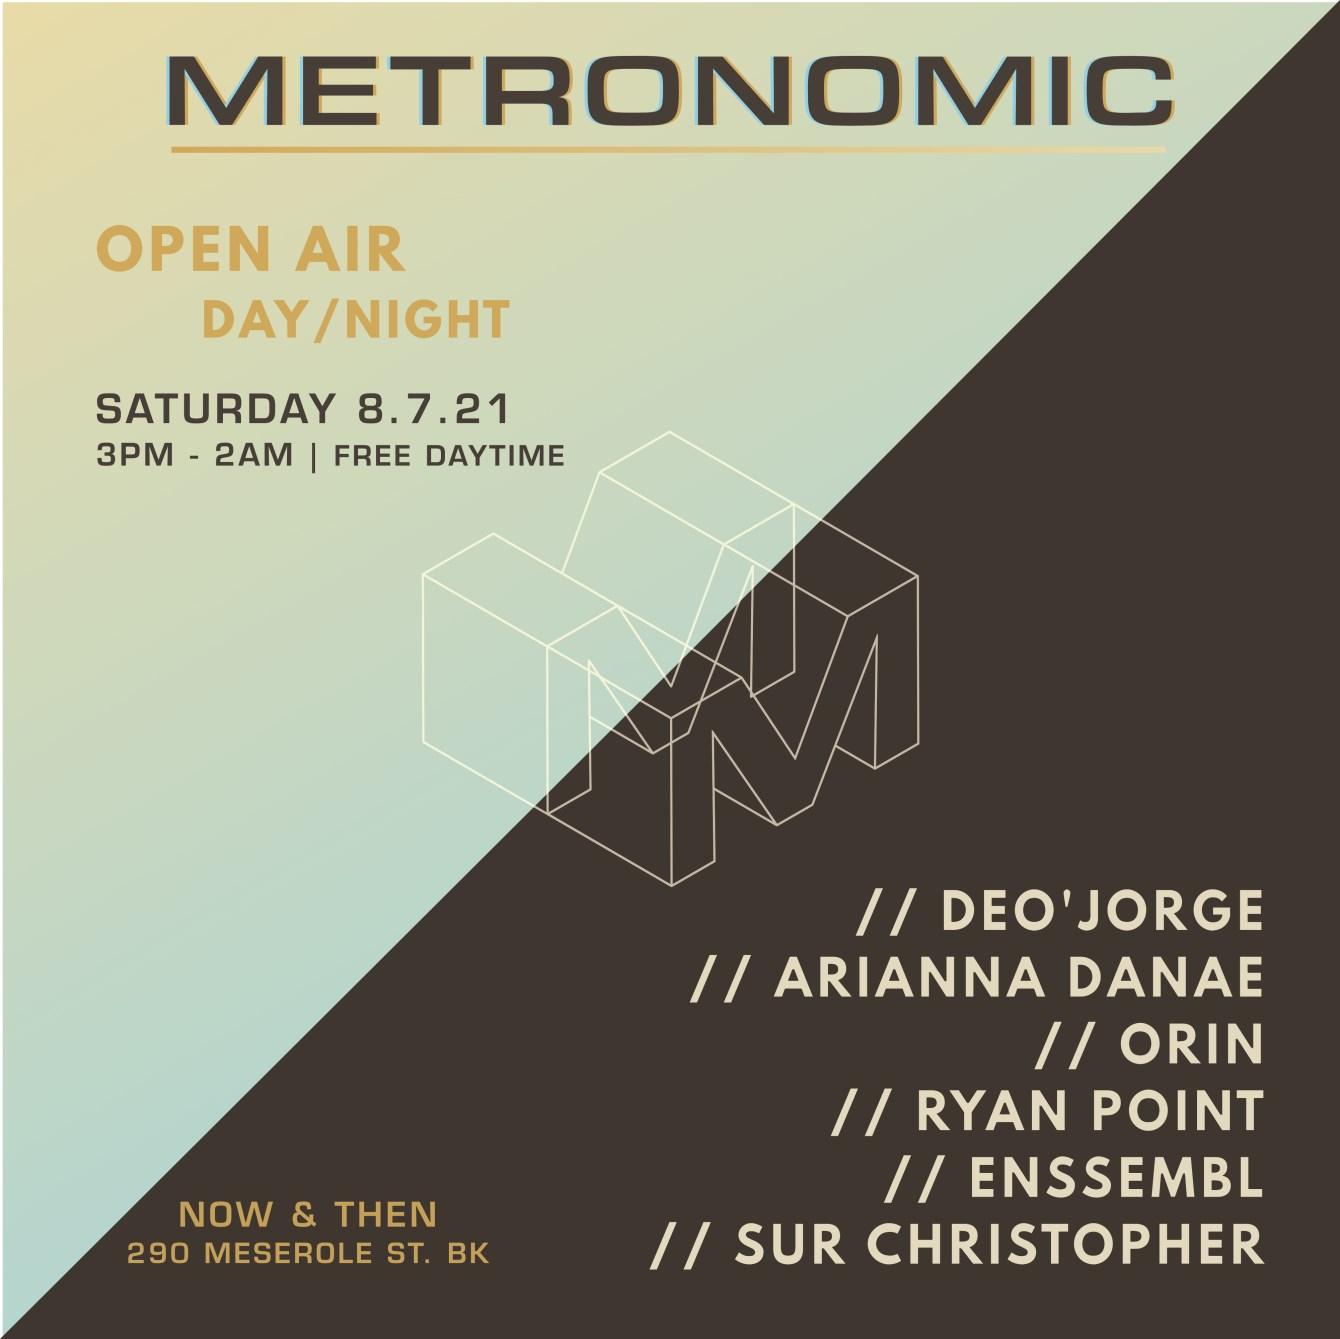 Metronomic - Open Air - Deo'jorge/Orin/Arianna DANAE/Ryan Point/Enssembl/Sur Christopher - Flyer front